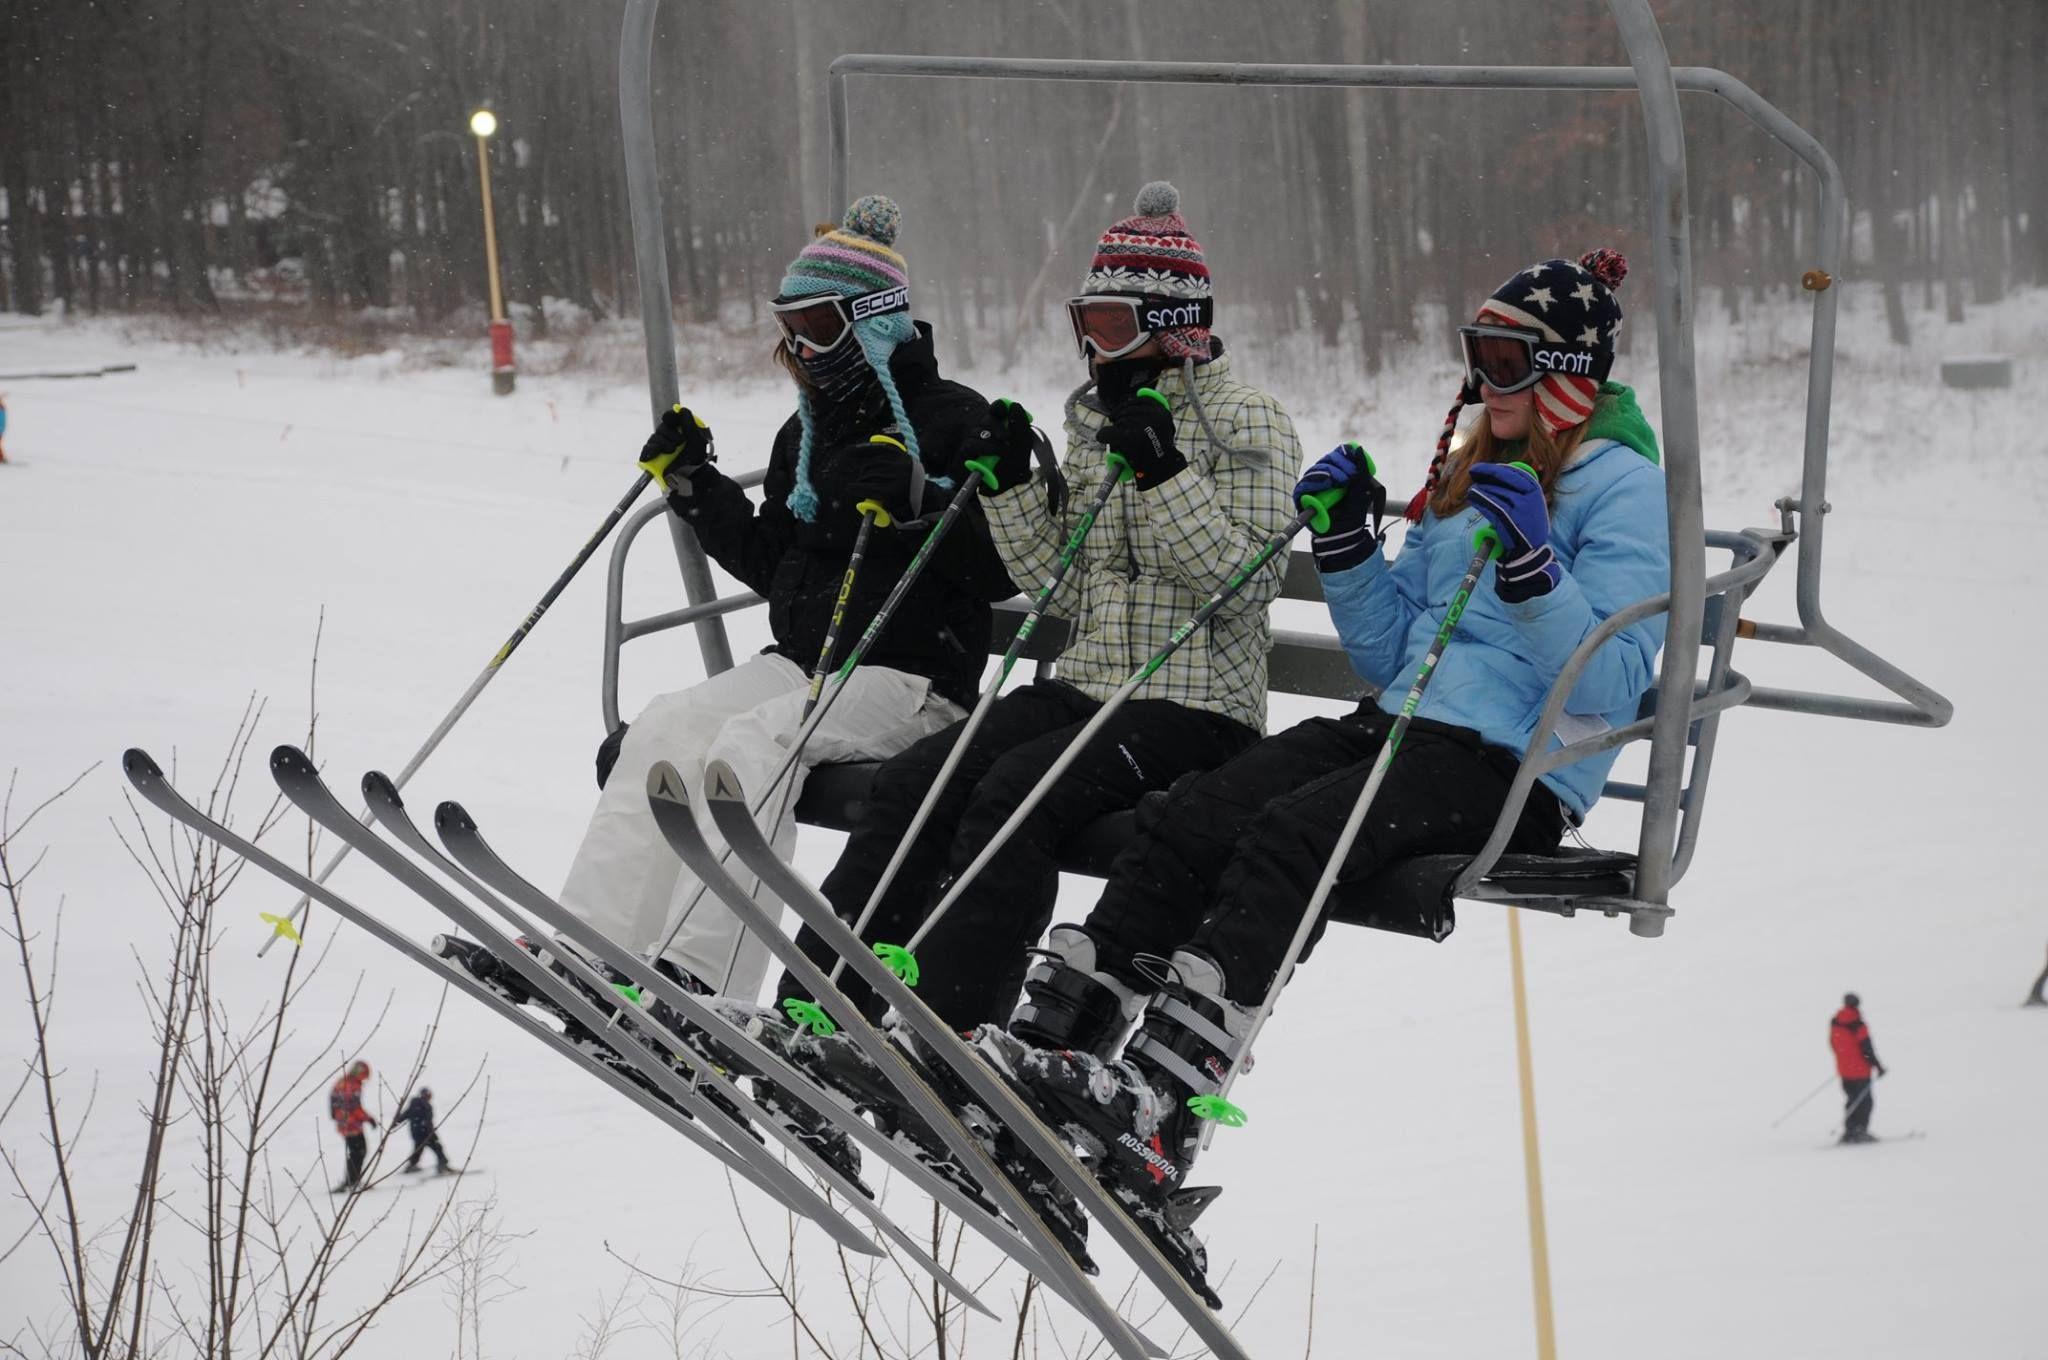 Nemacolin Woodlands Resort Downhill Skiing Skiing Snowboarding Skiing